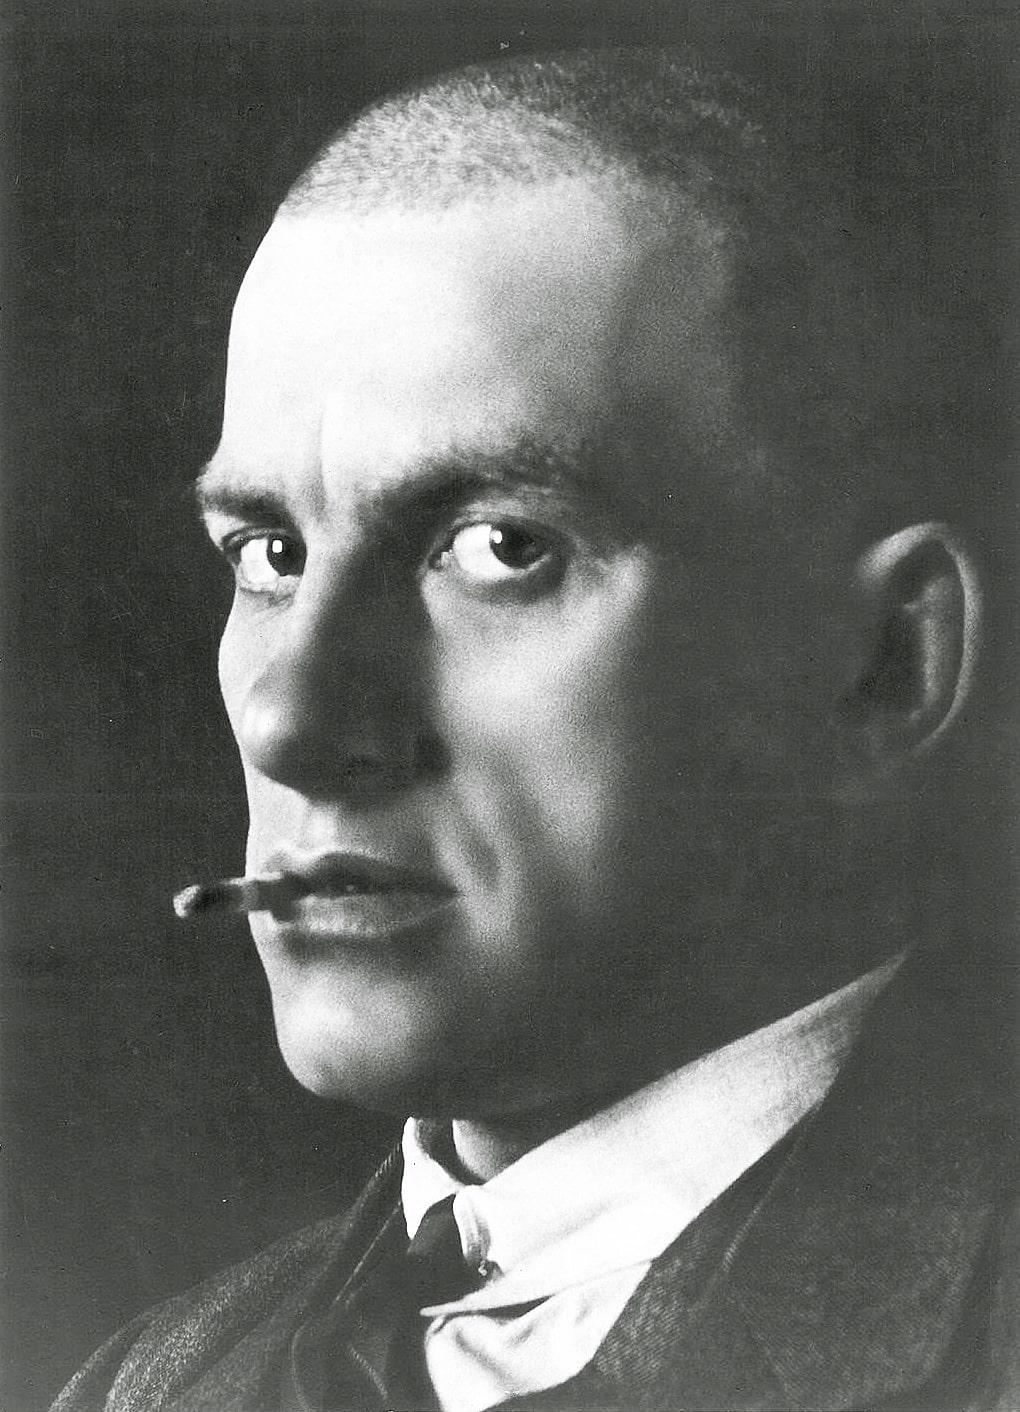 Vladimir-Mayakovskiy-7